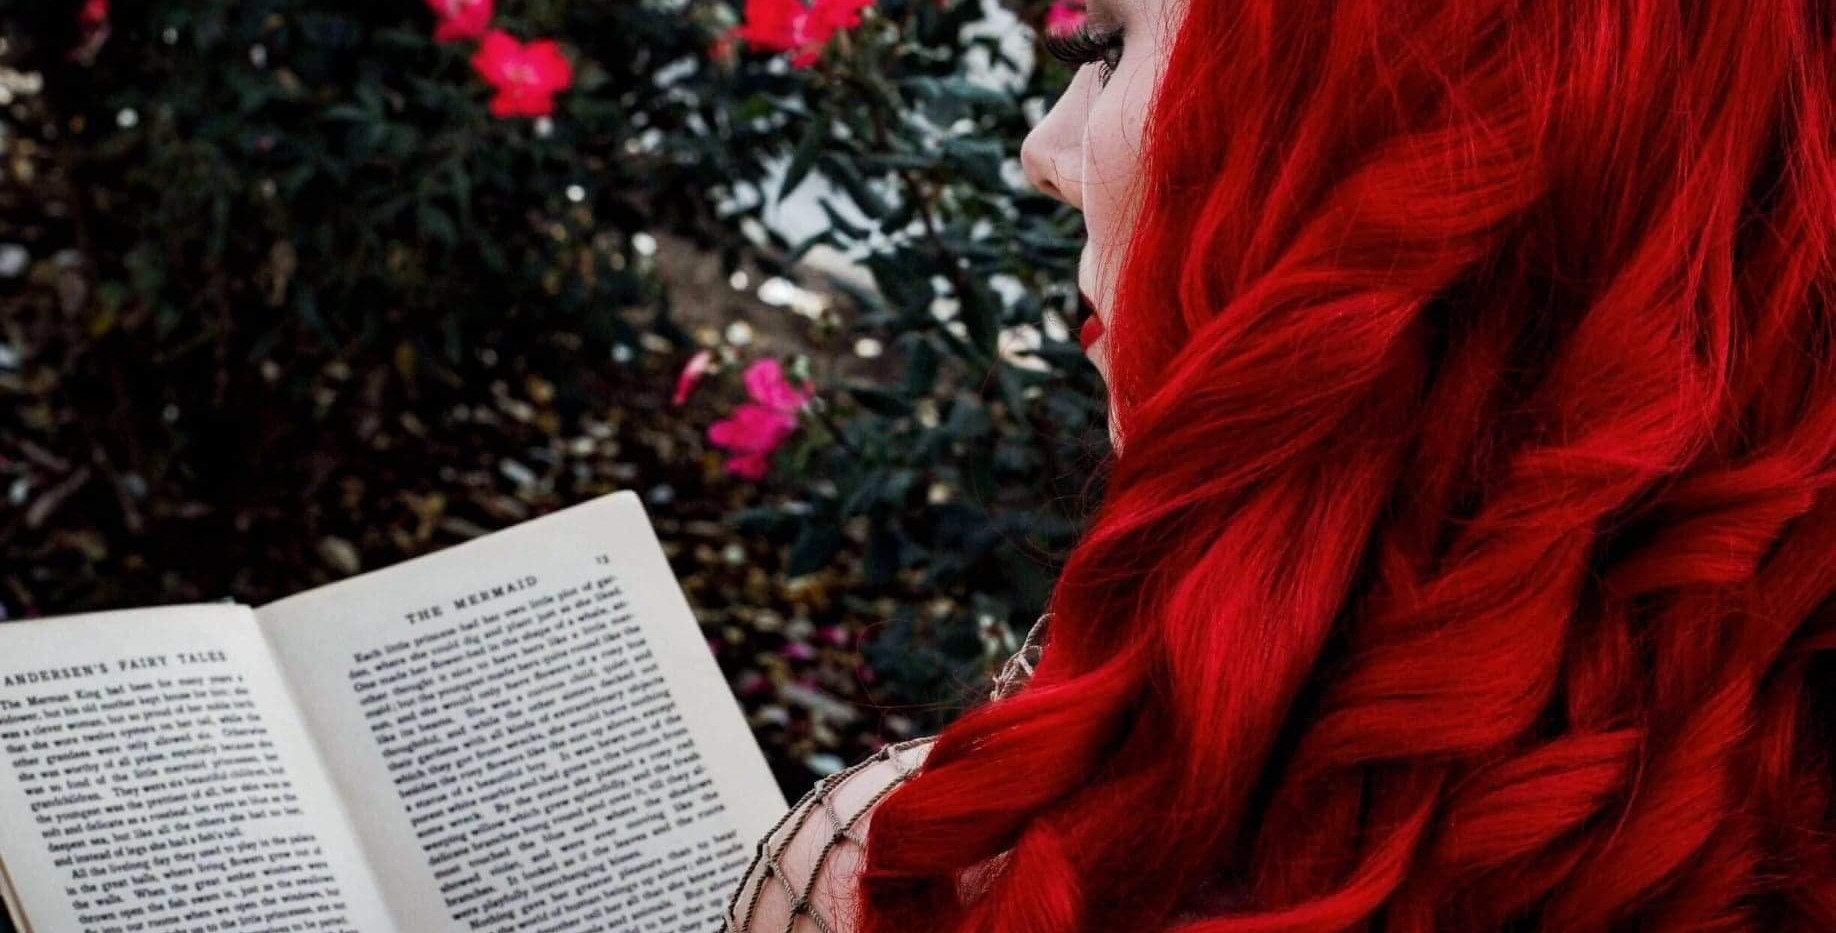 Little Mermaid reading a book